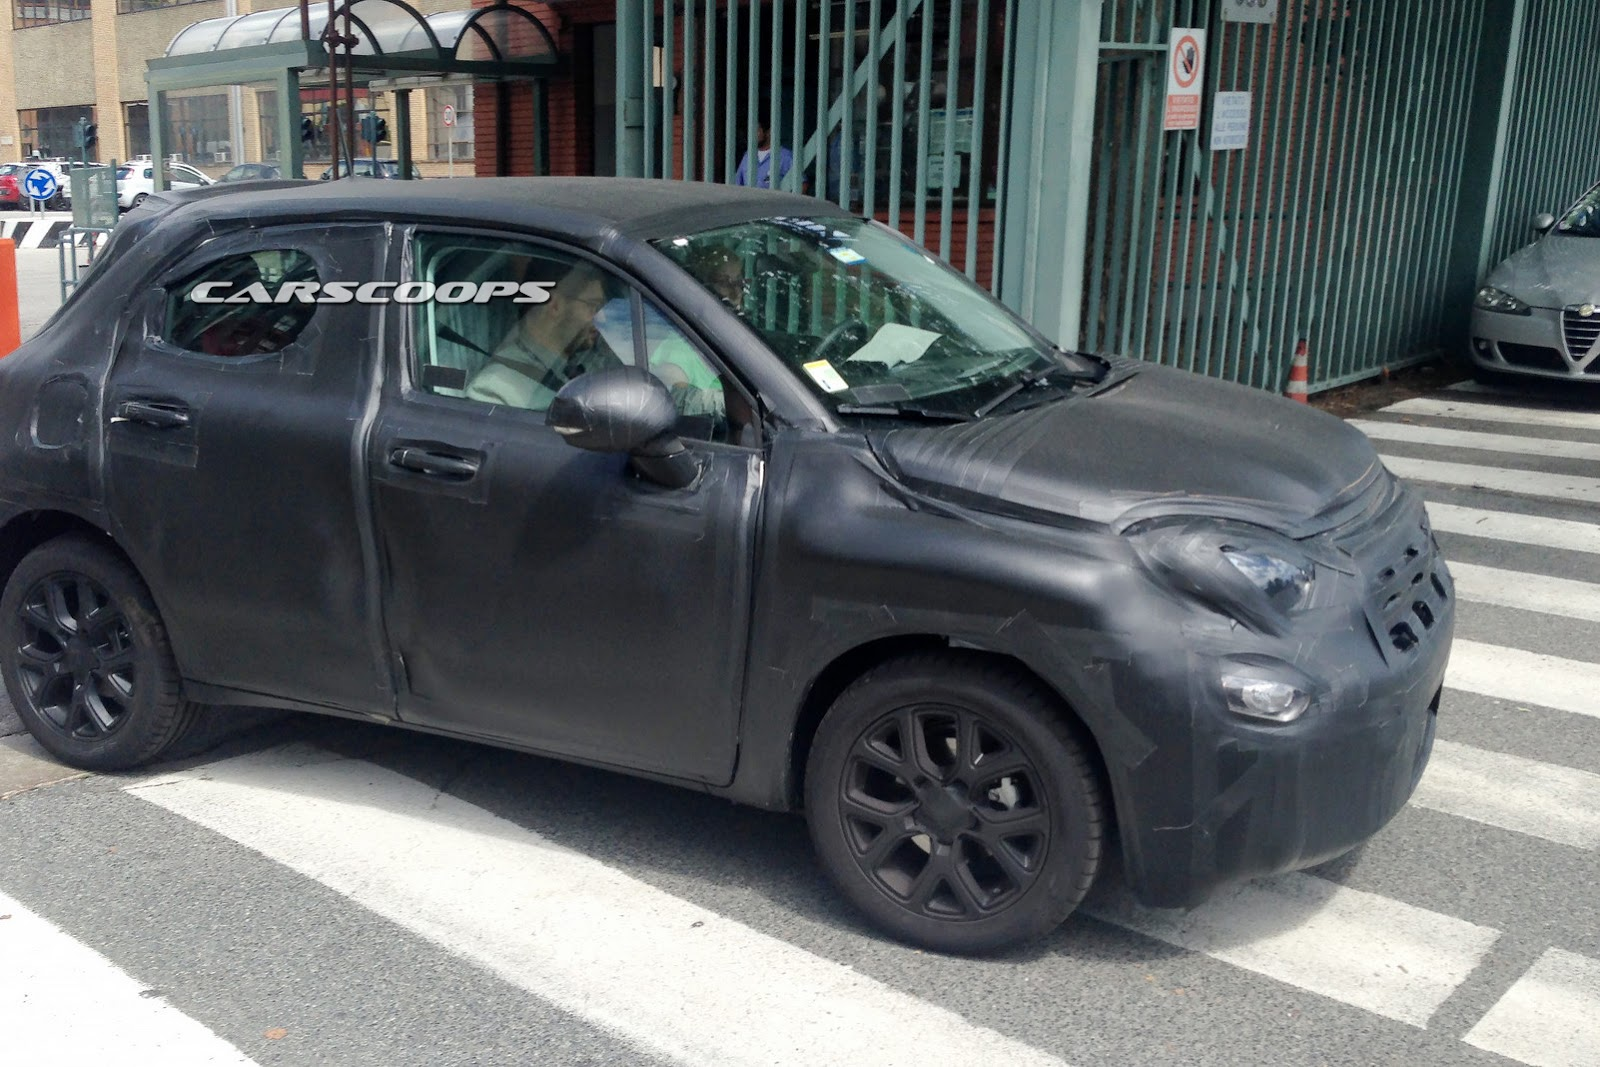 Fiat 500 X (Crossover) 5